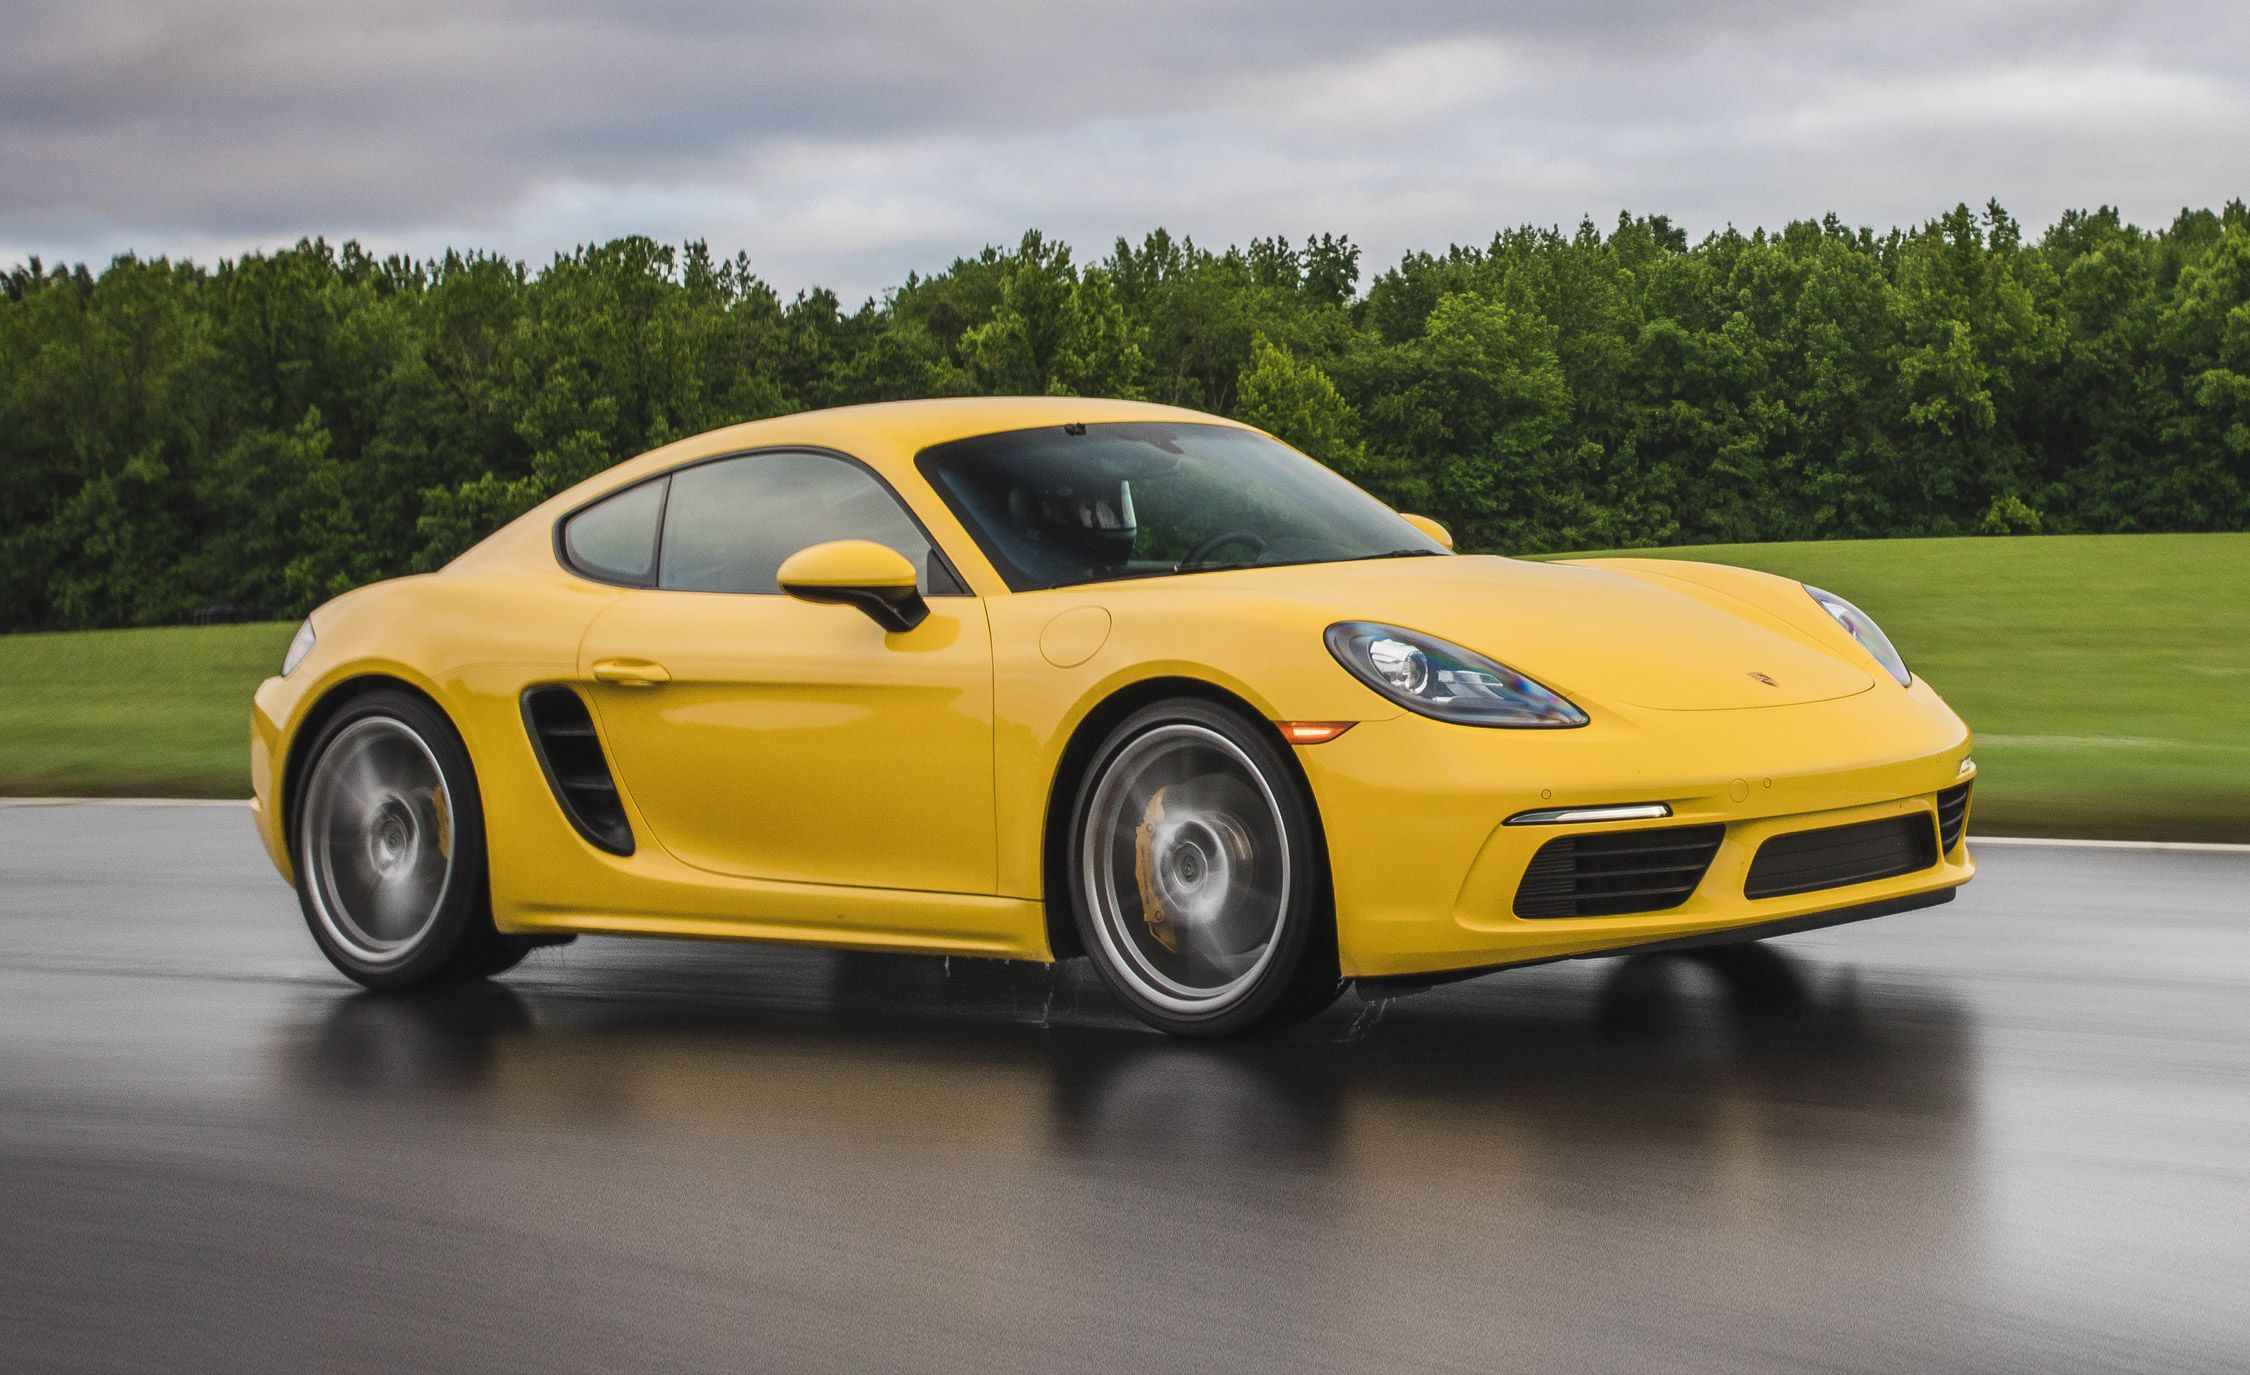 2021 Porsche 718 Cayman Reviews | Porsche 718 Cayman Price, Photos, and  Specs | Car and Driver